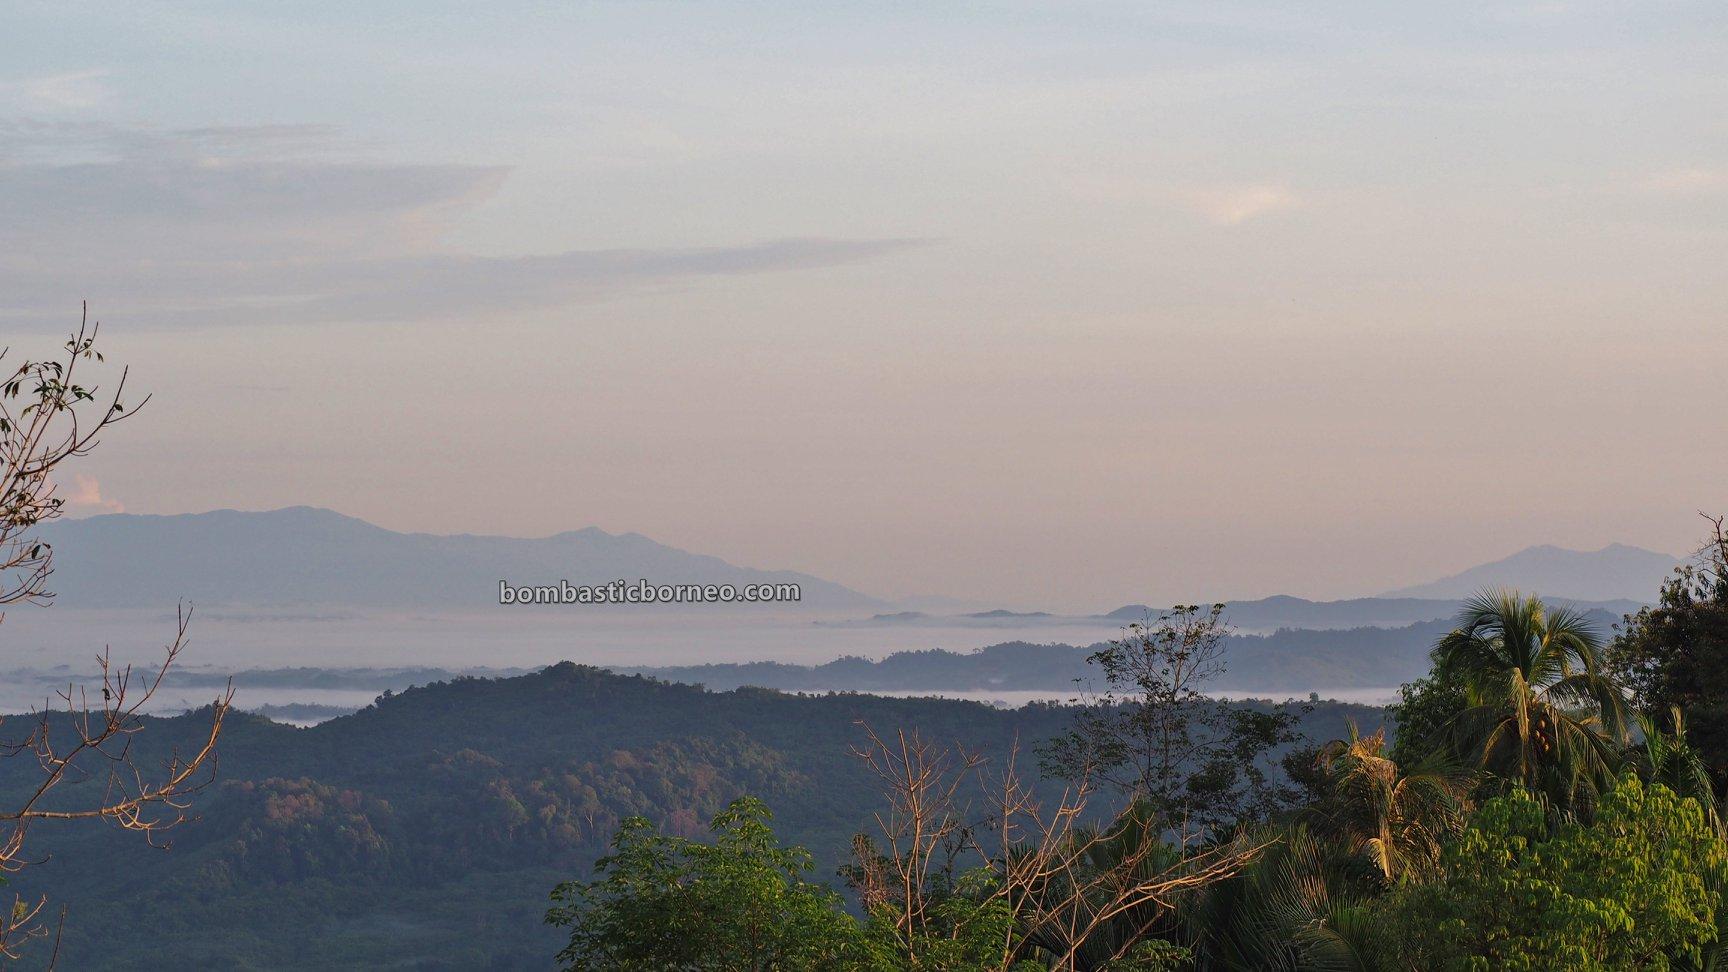 Dusun Tamong, adventure, authentic, Traditional, village, backpackers, destination, Dayak Bidayuh, native, tribe, tourist attraction, travel guide, Trans Borneo, 婆罗洲达雅高原, 印尼西加里曼丹,